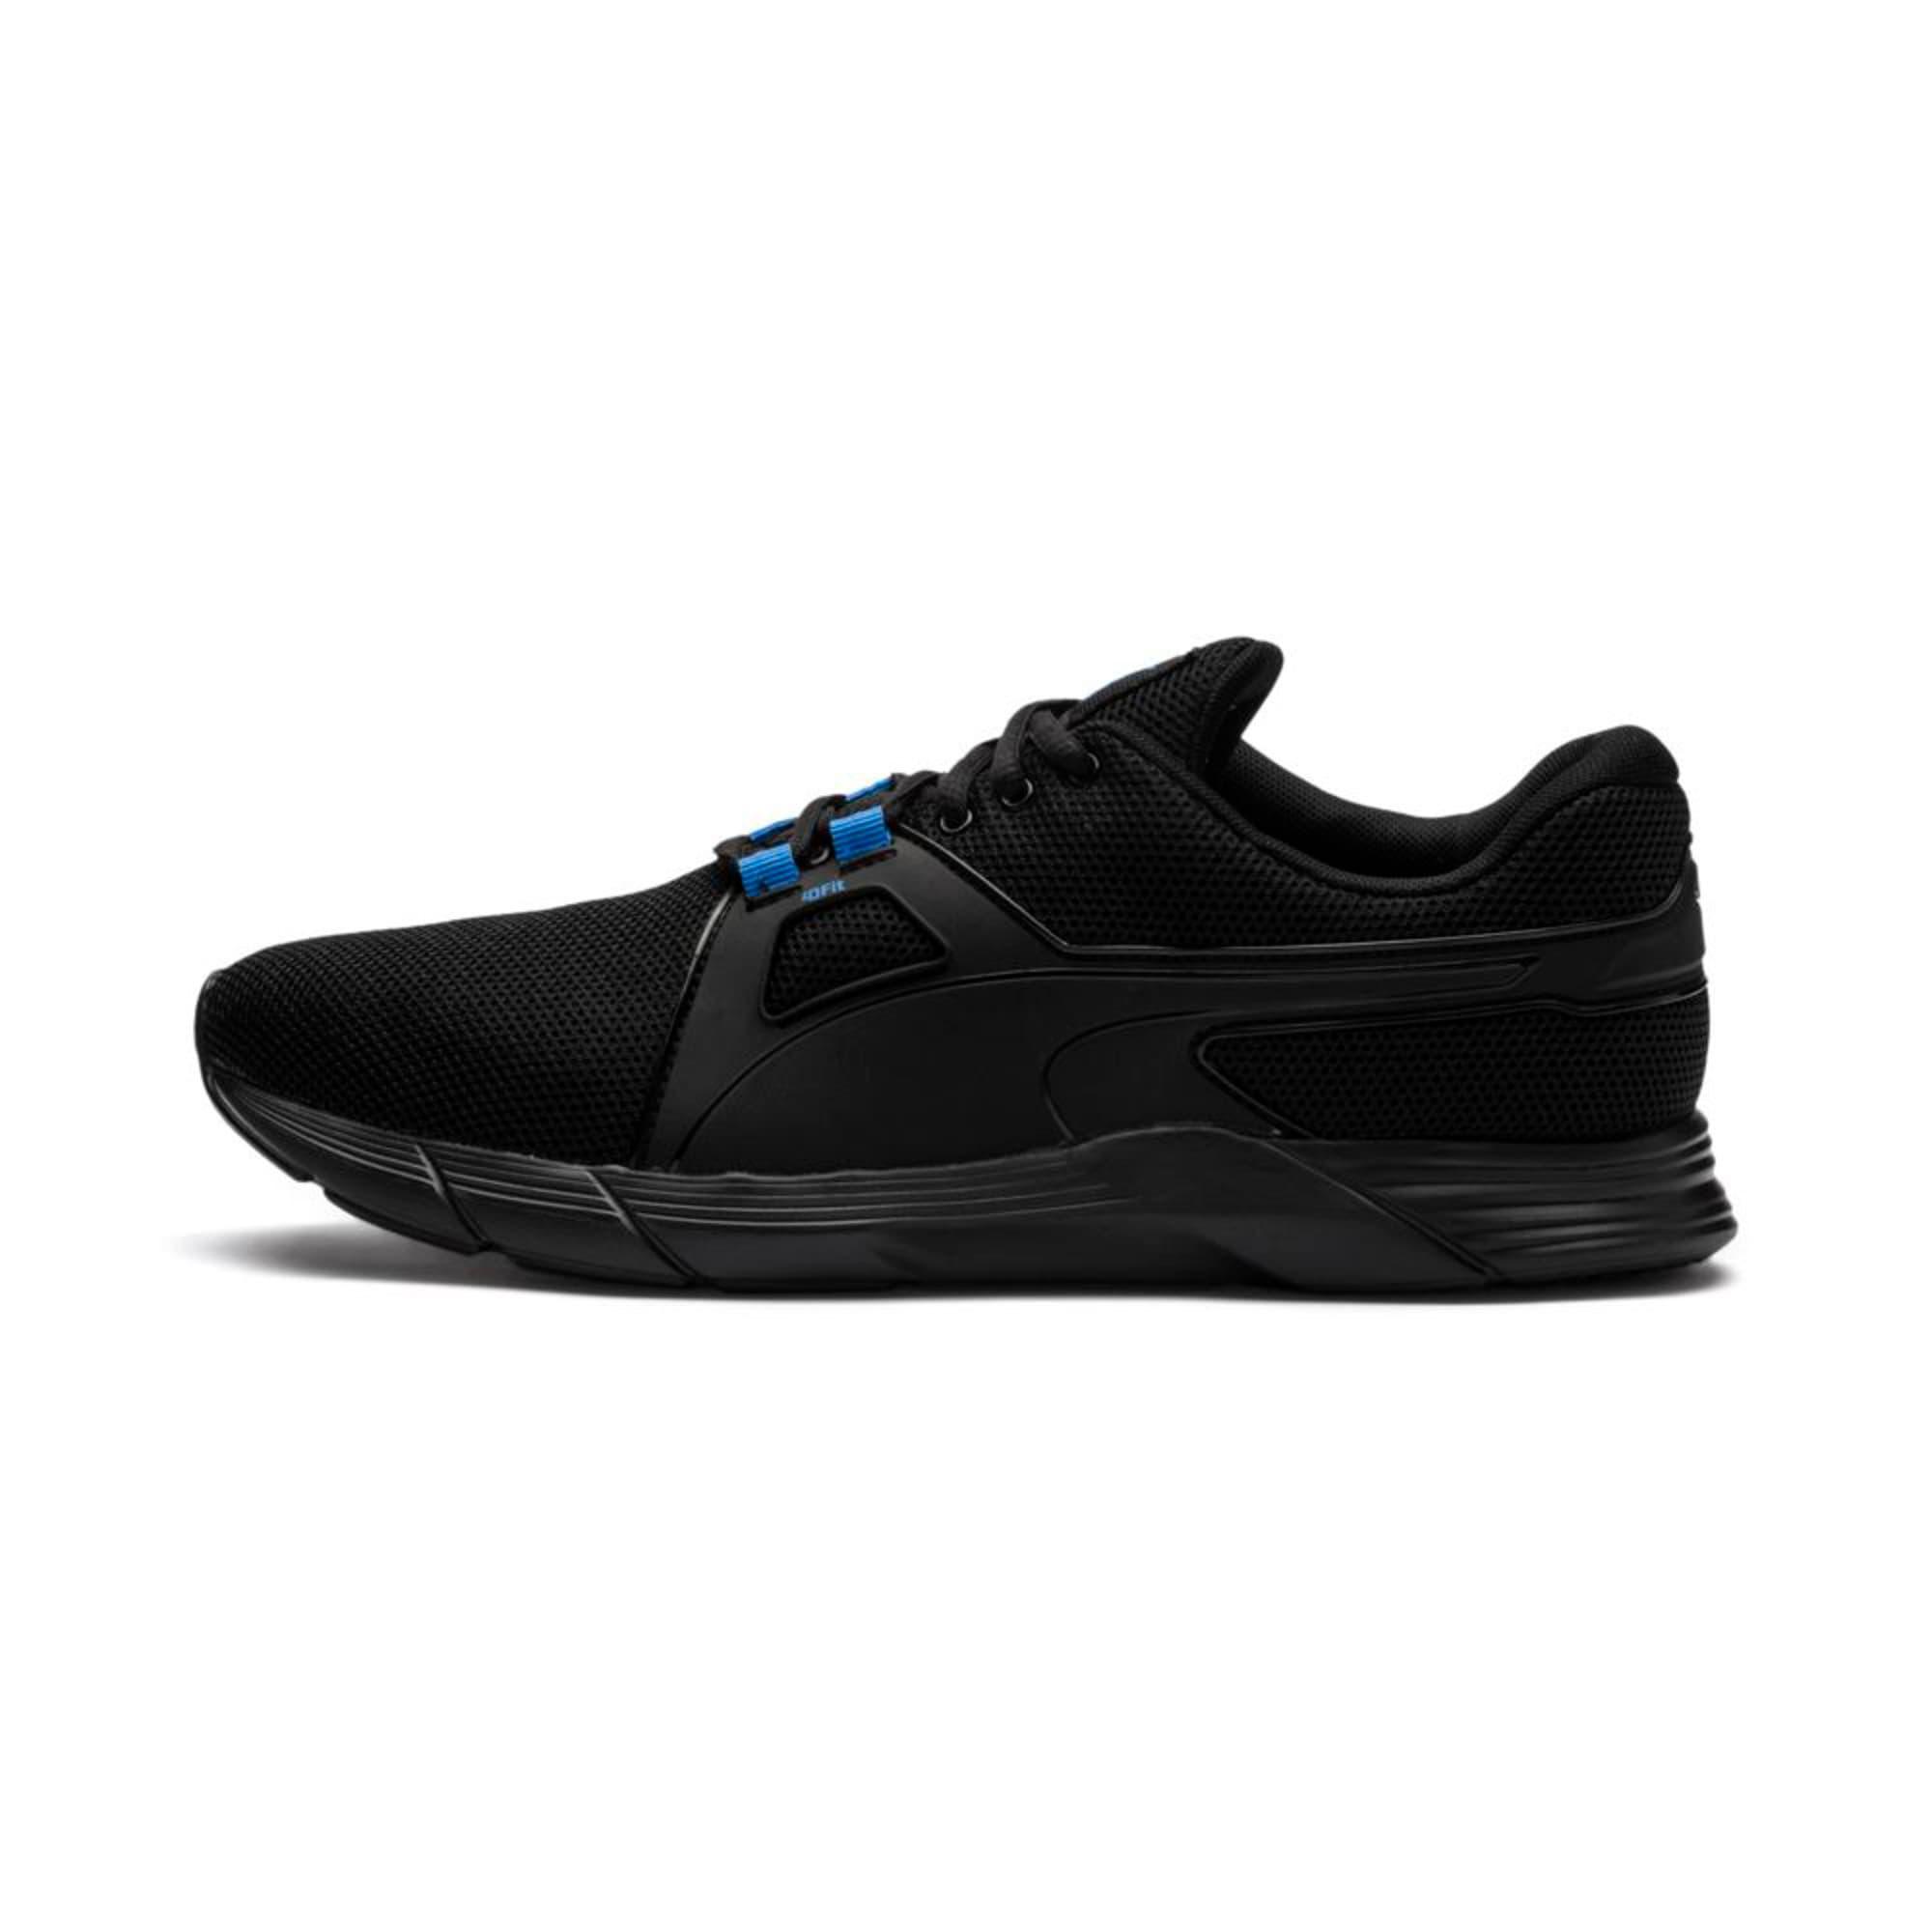 Thumbnail 1 of Propel XT Men's Training Shoes, Puma Black-Strong Blue, medium-IND